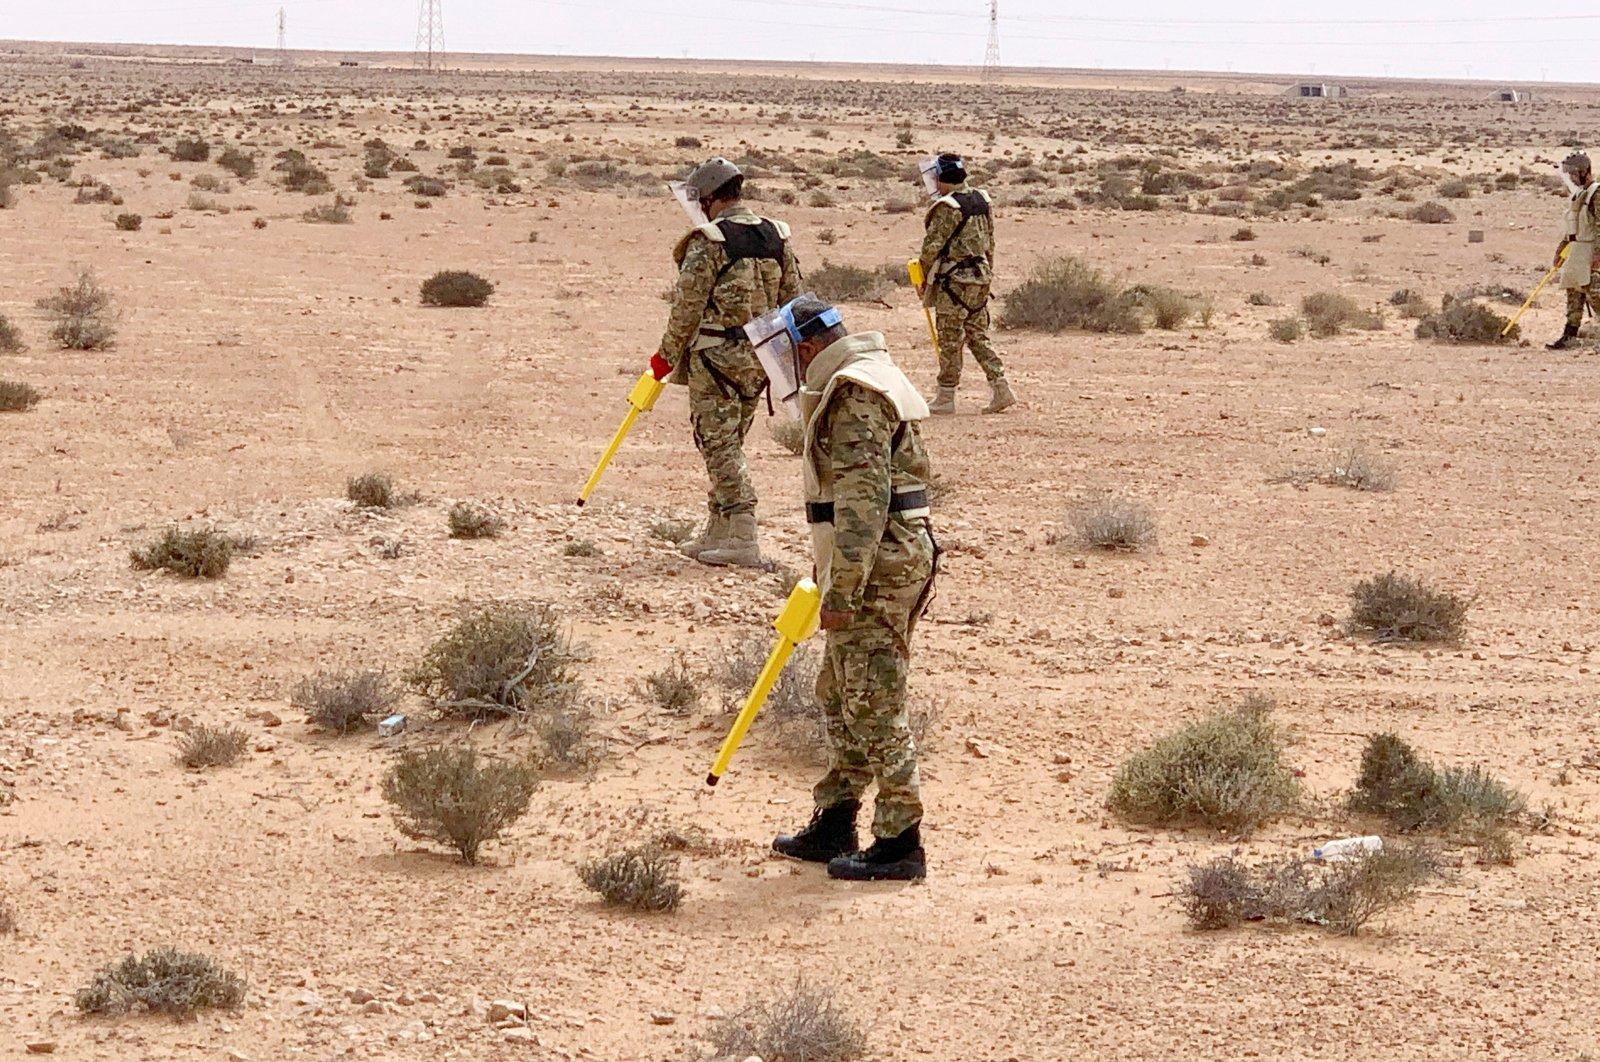 Members of the military engeneering team dismantle mines in Abu Grein, Libya, March 13, 2021. (REUTERS Photo)